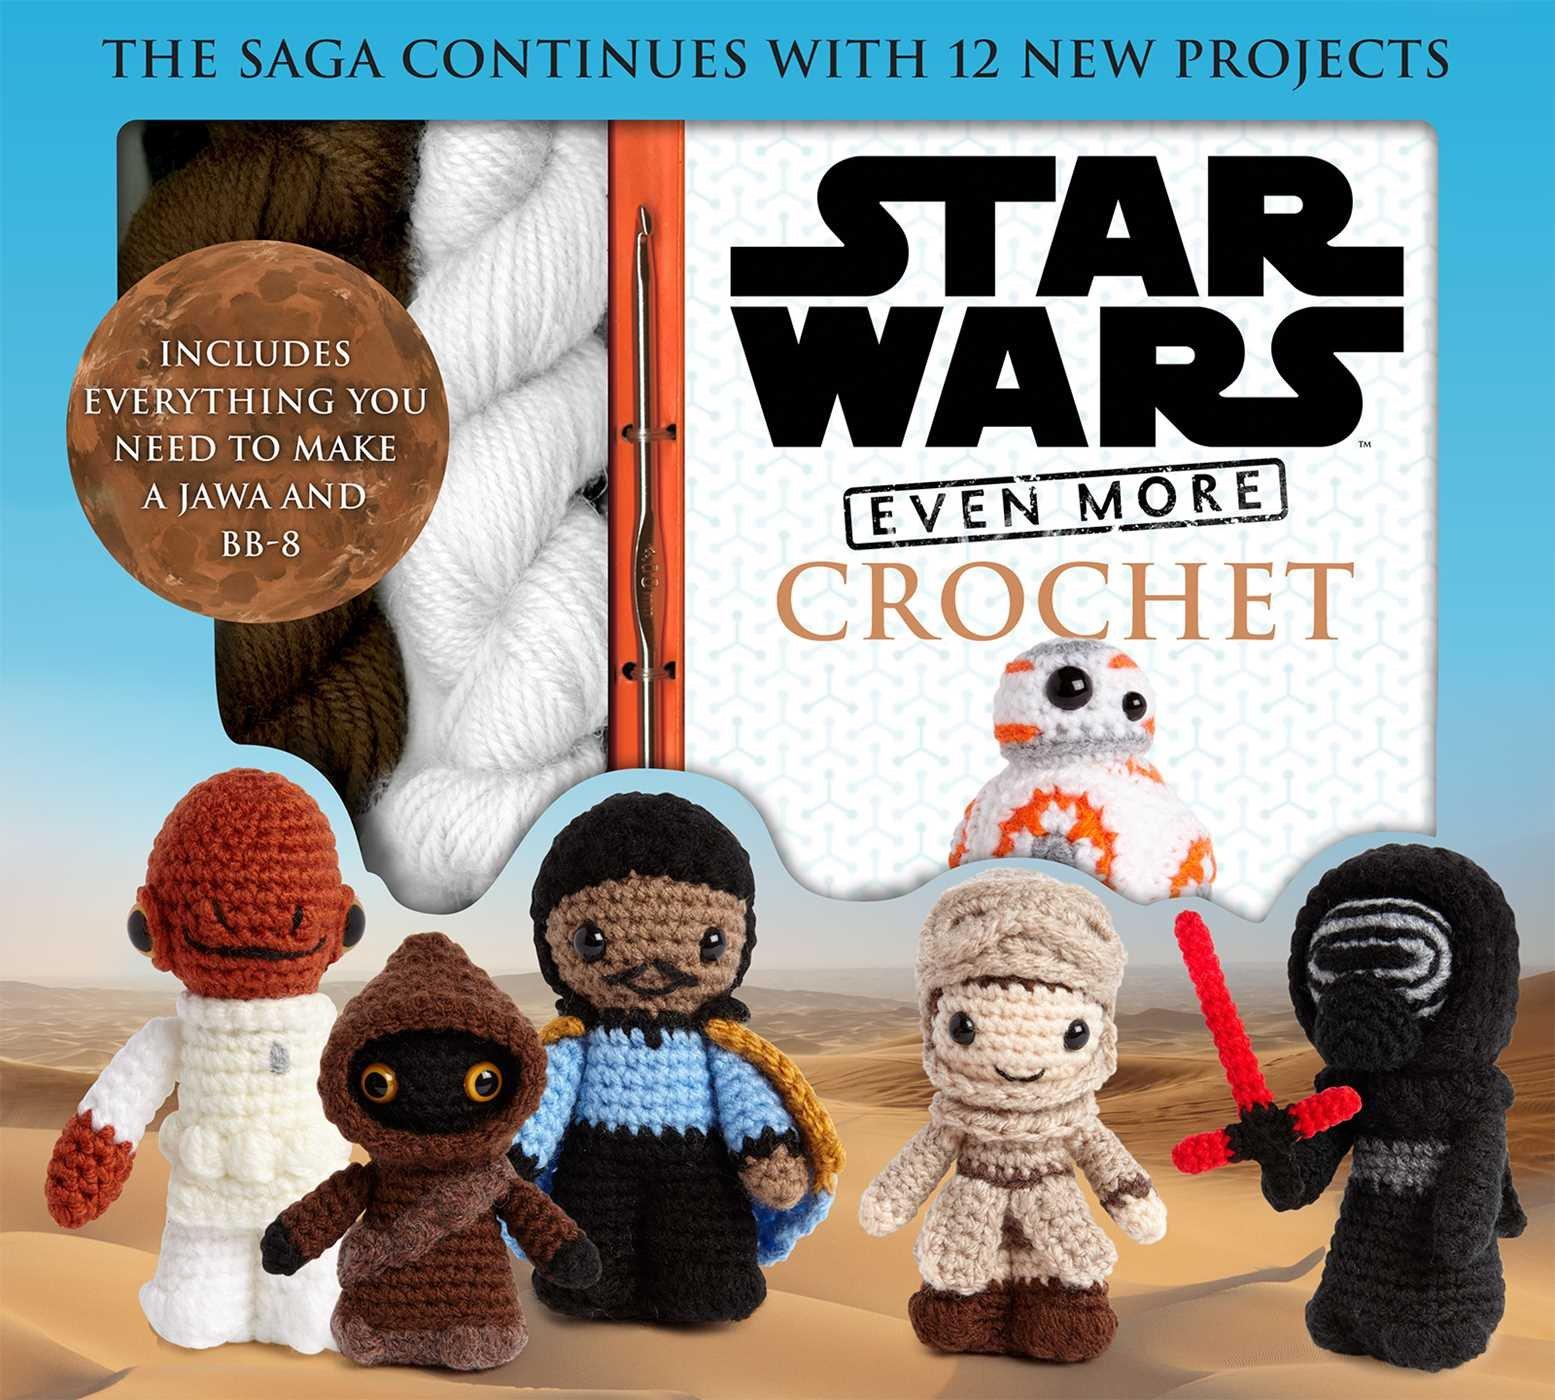 Star Wars Even More Crochet (Crochet Kits) pdf